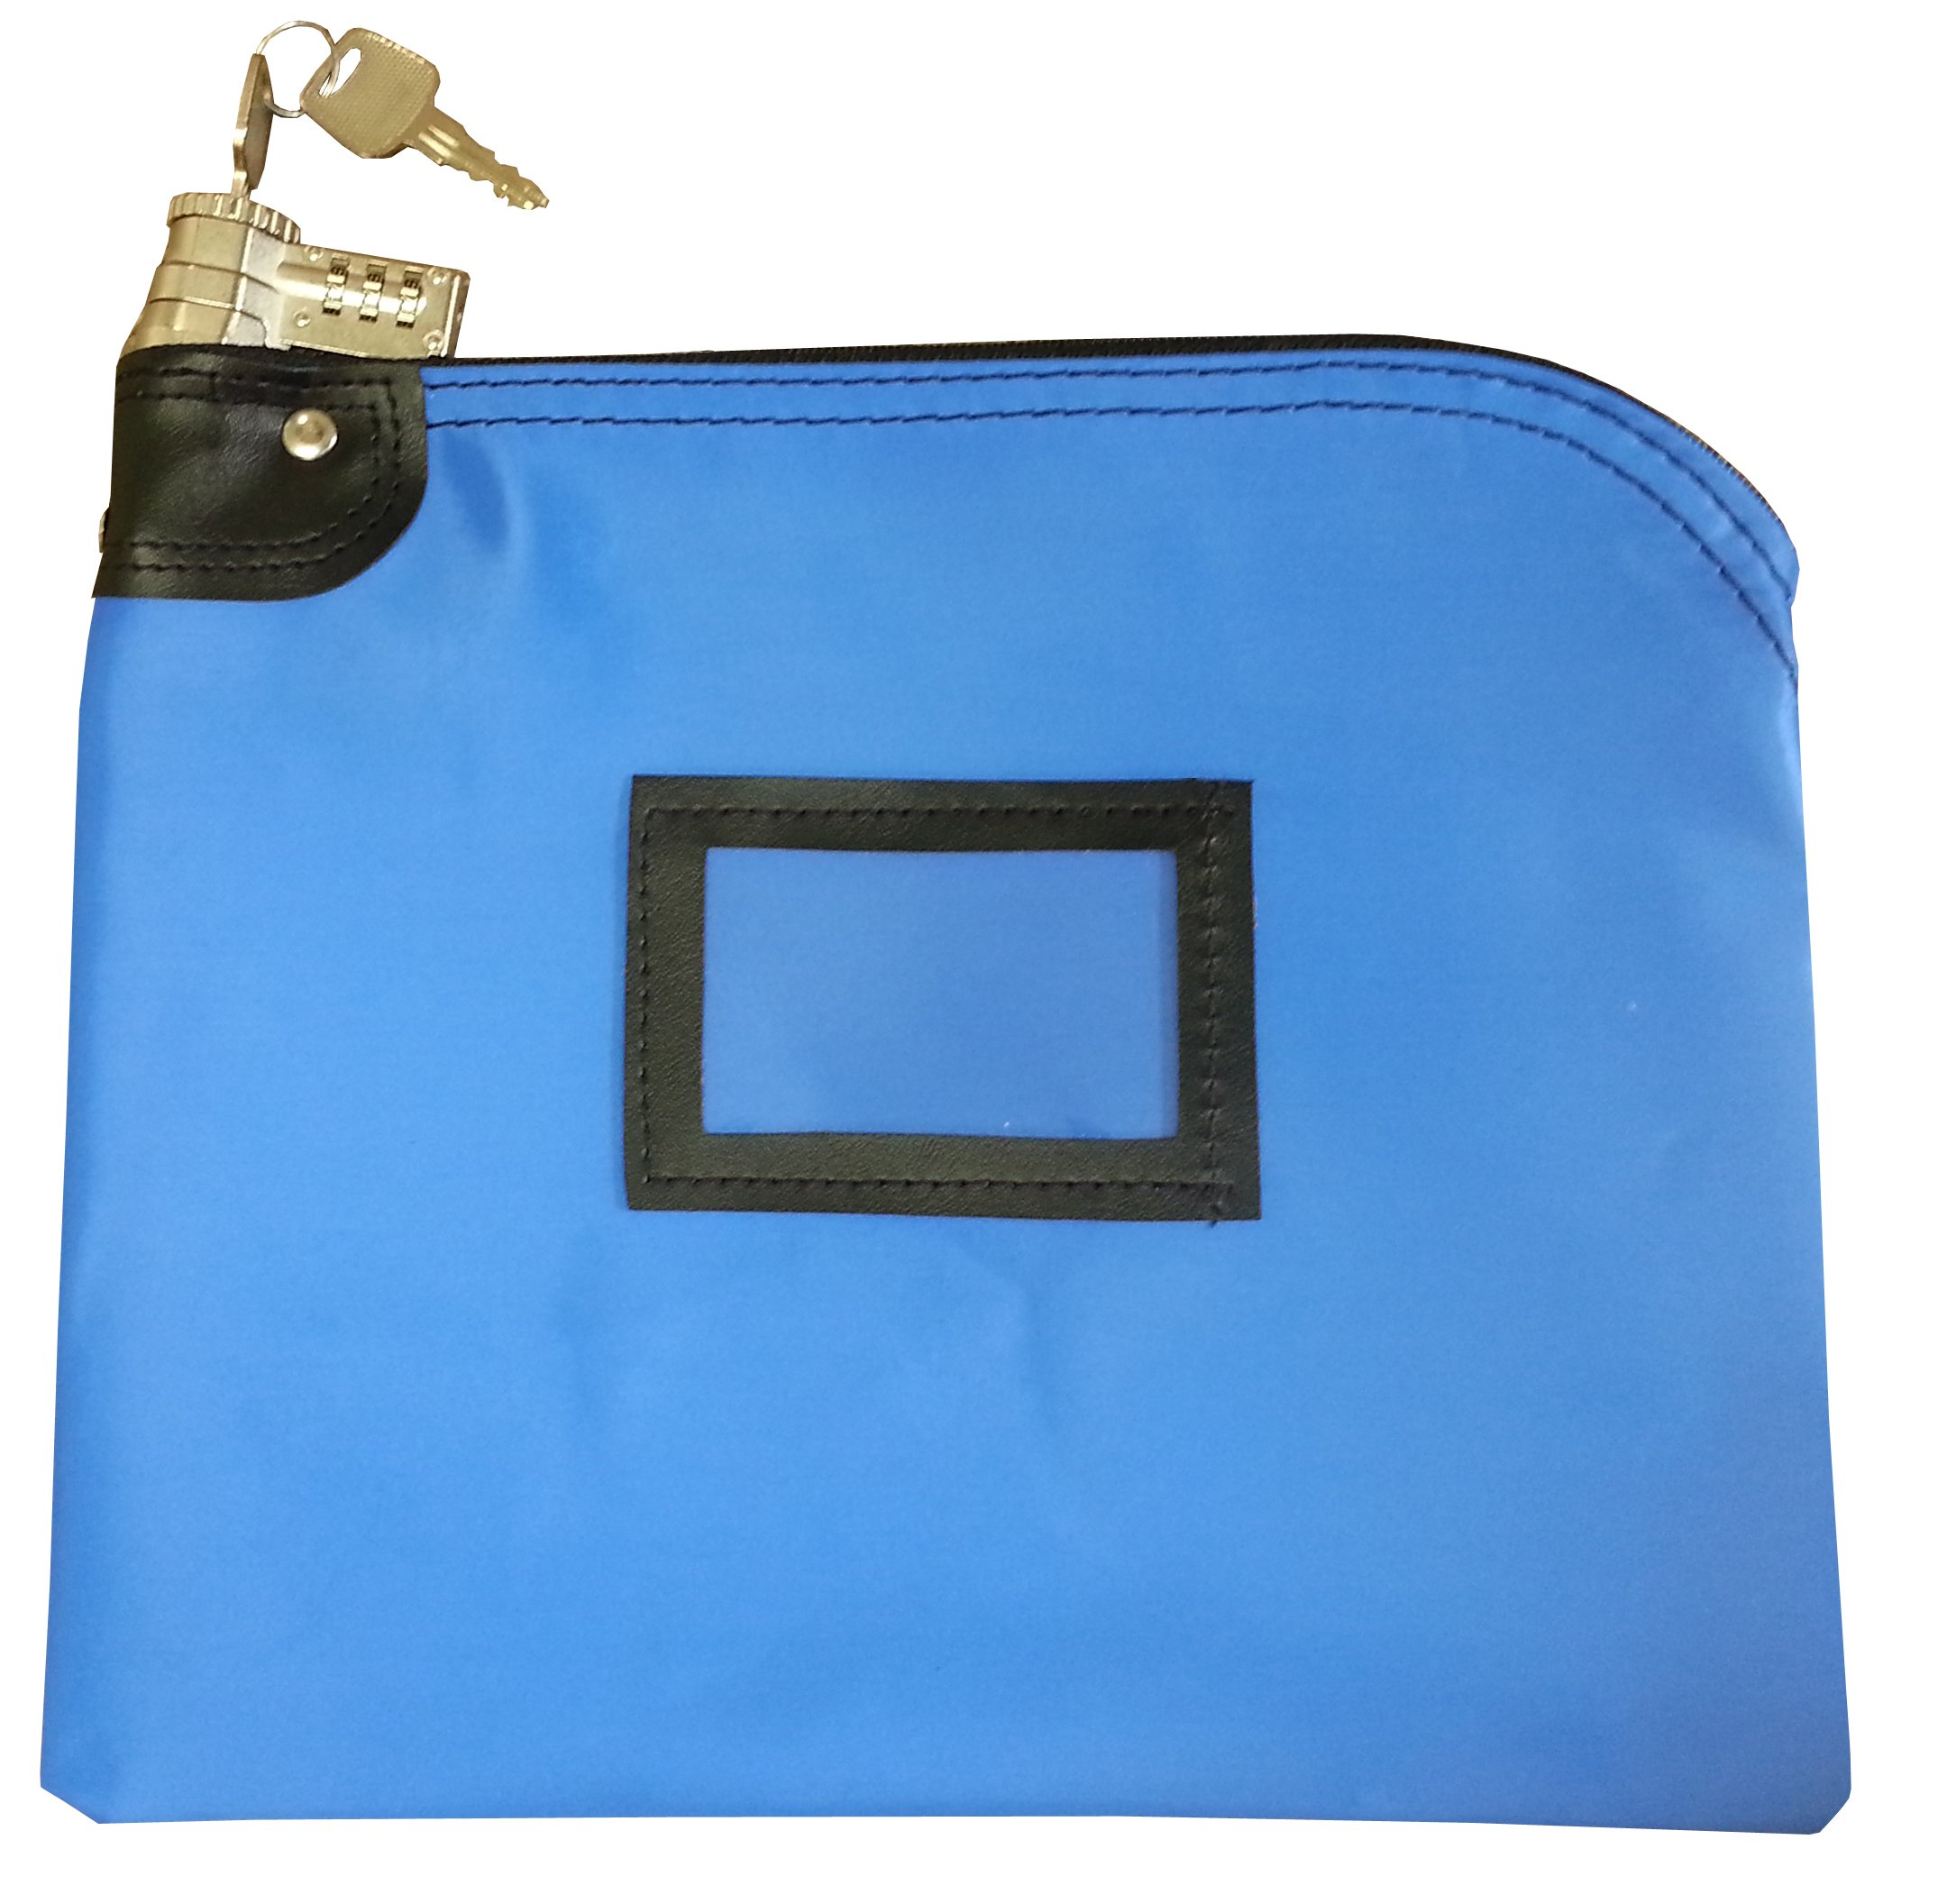 Locking Bank Bag Laminated Nylon Combination and Keyed Security System Royal Blue